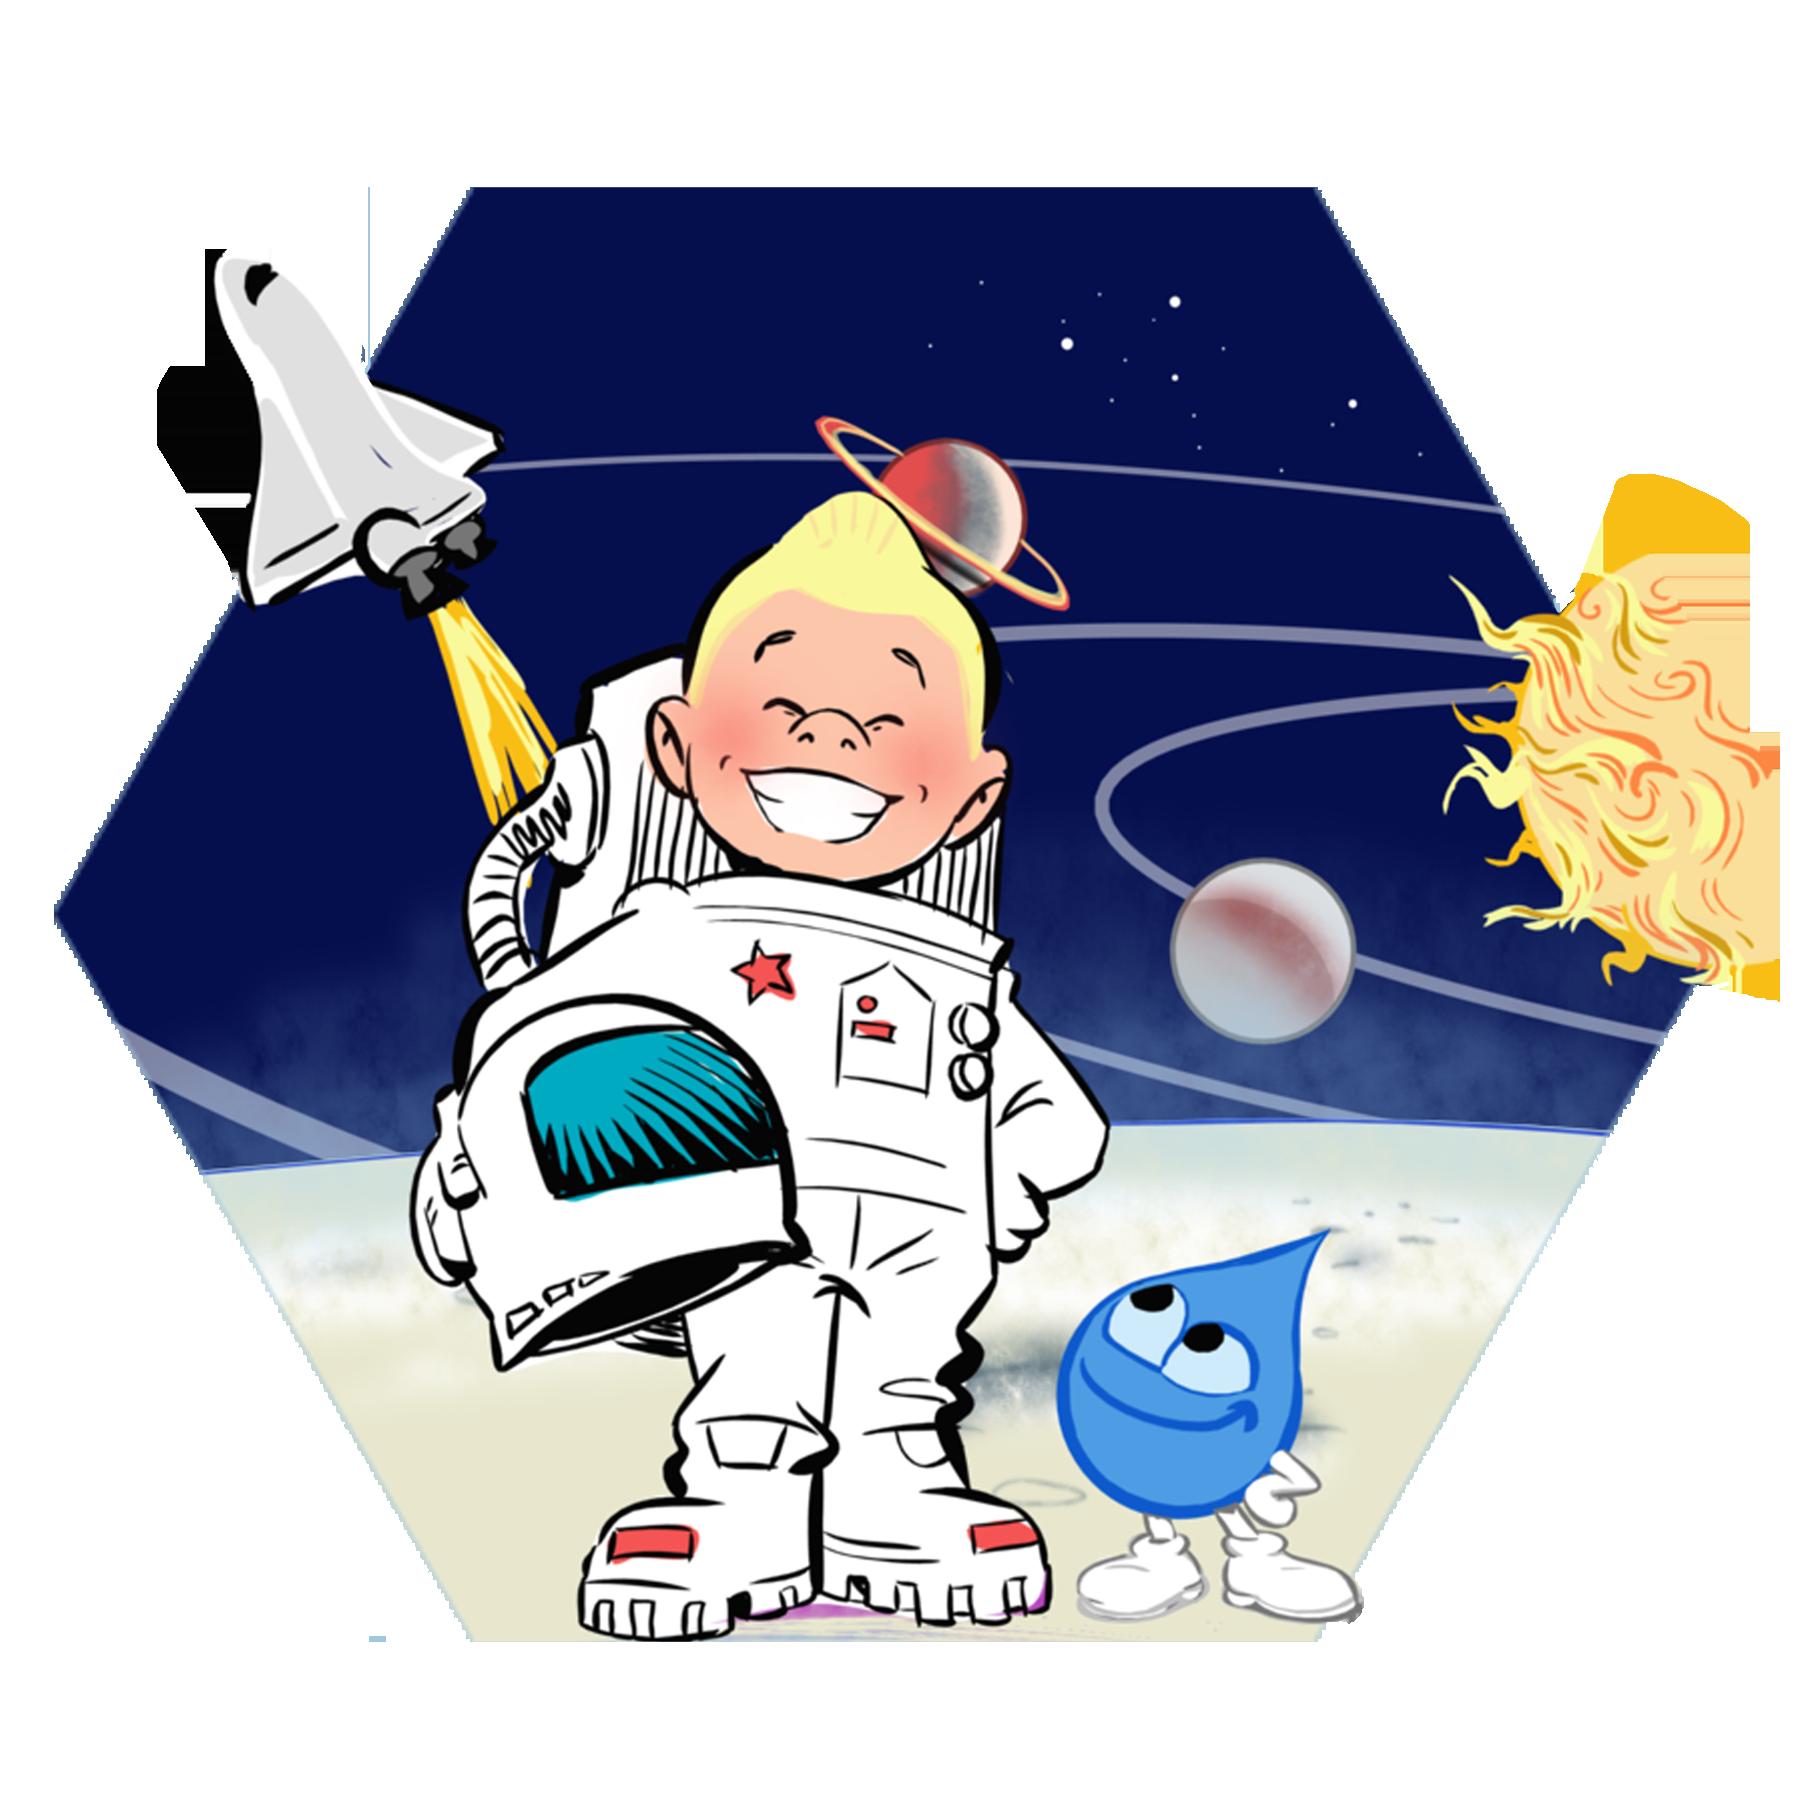 Profaqua explorationspatialeprojet. Spaceship clipart space exploration